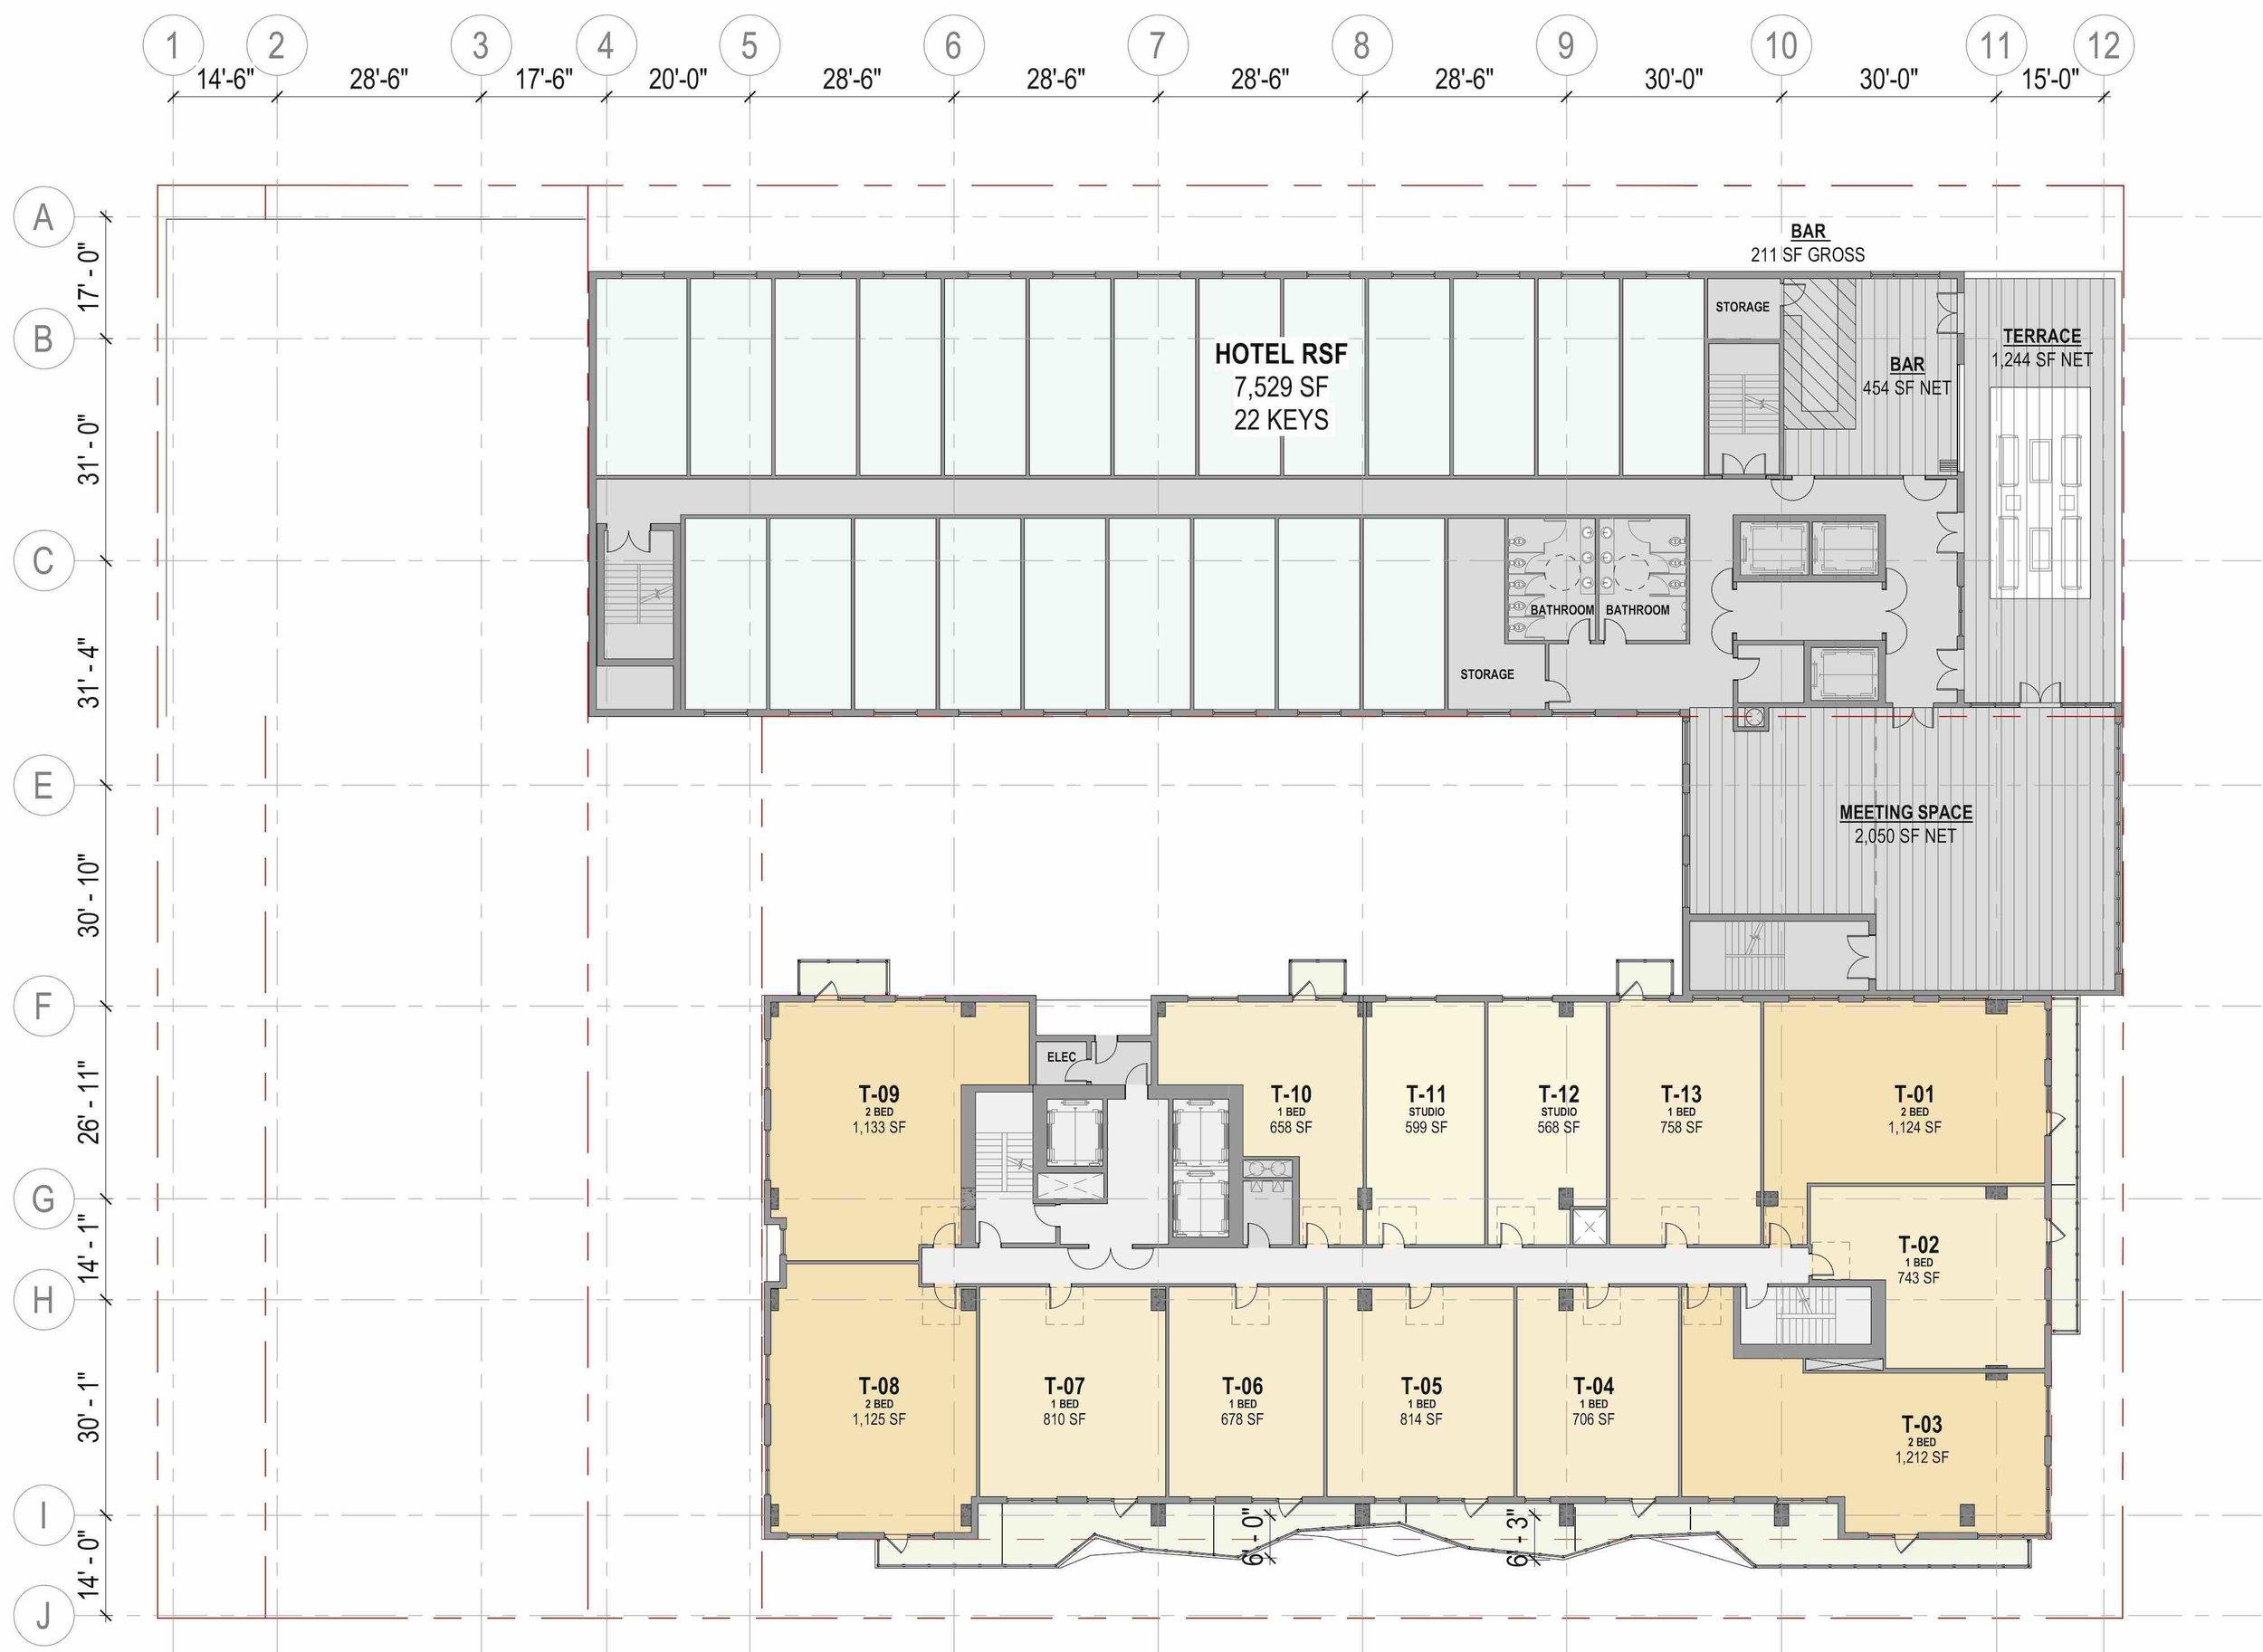 Site Plan - 8th Floor (Hotel Amenities)